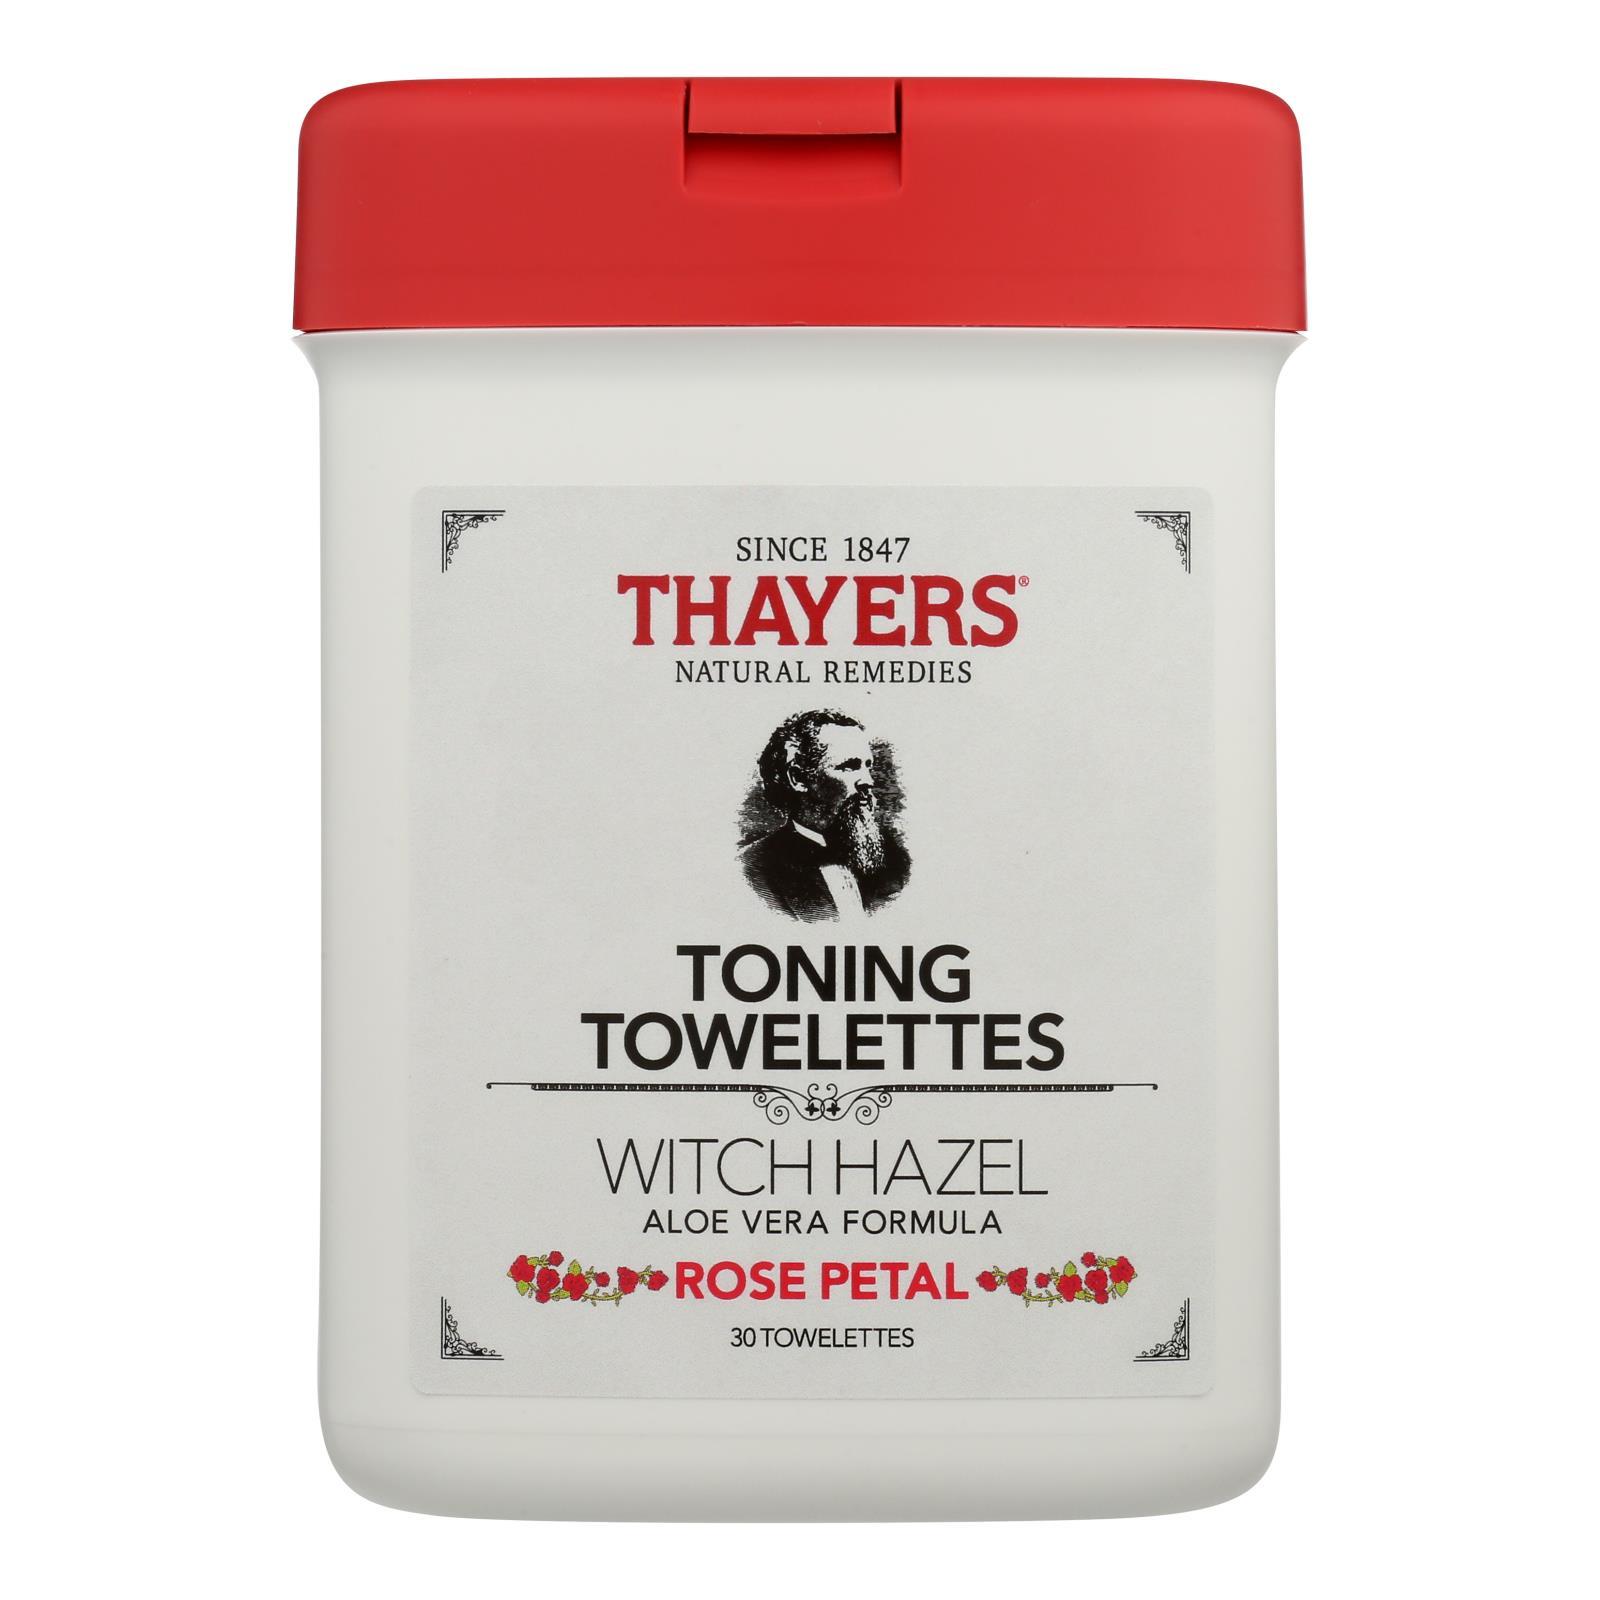 Thayers - Toner Twlttes Rose Petal - 1 Each - 30 CT